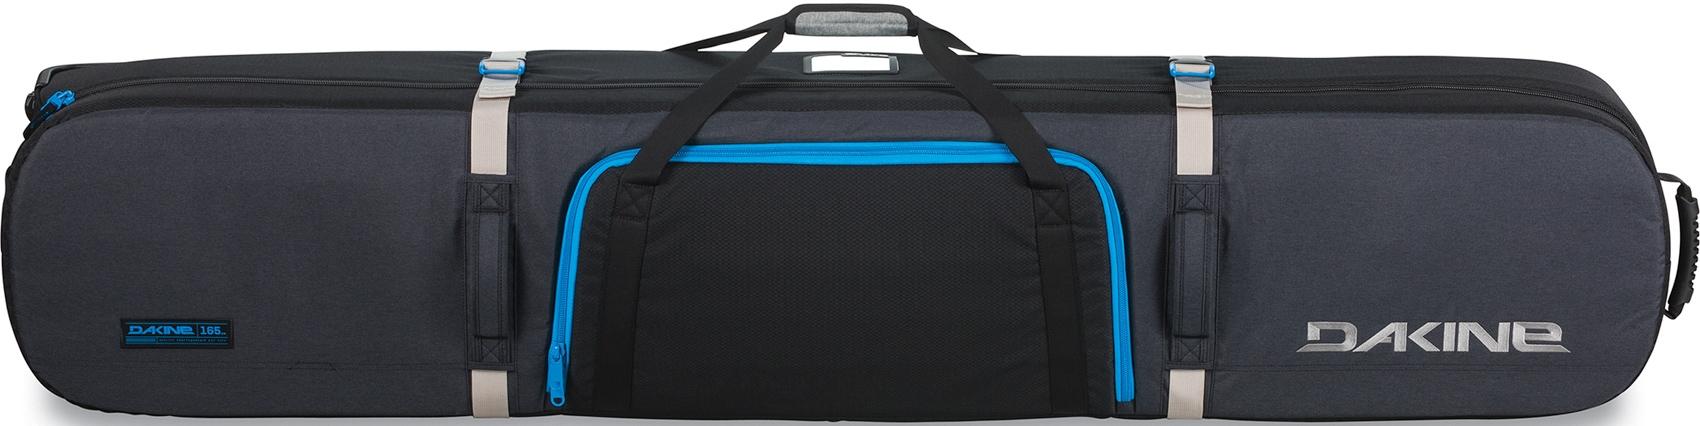 Dakine High Roller 165cm Snowboard Bag, $220